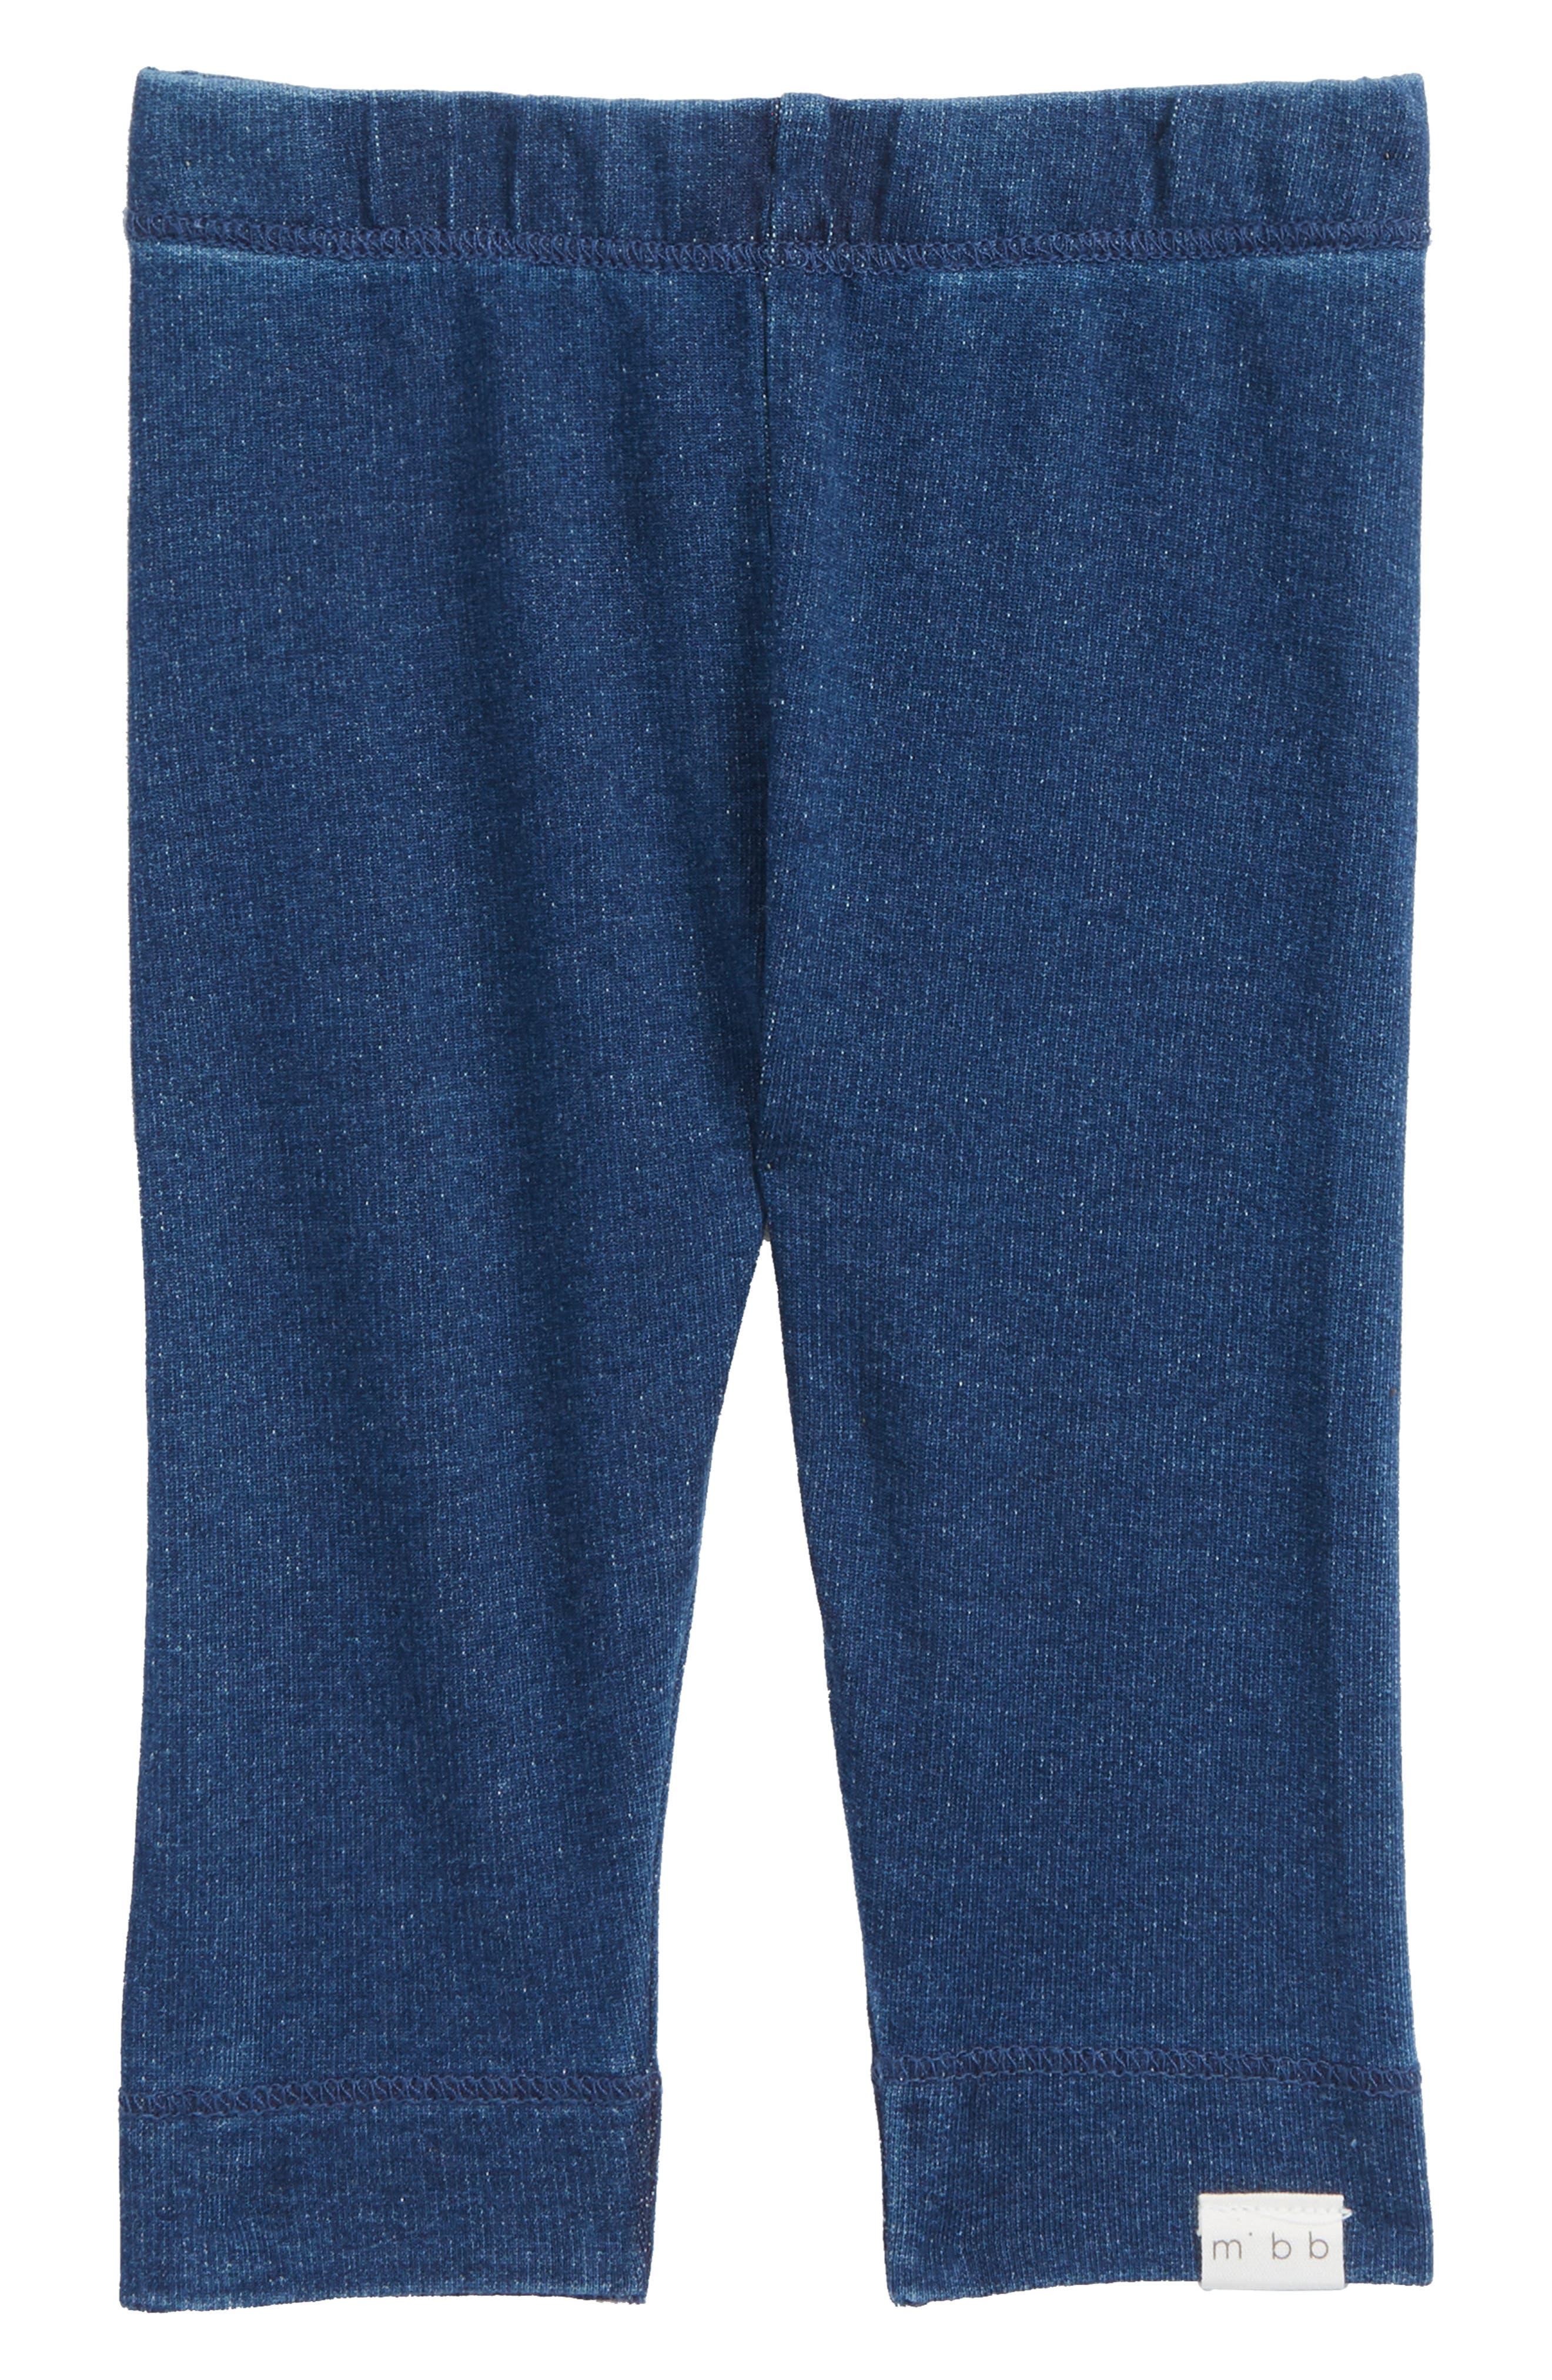 Knit Leggings,                         Main,                         color, Blue Denim